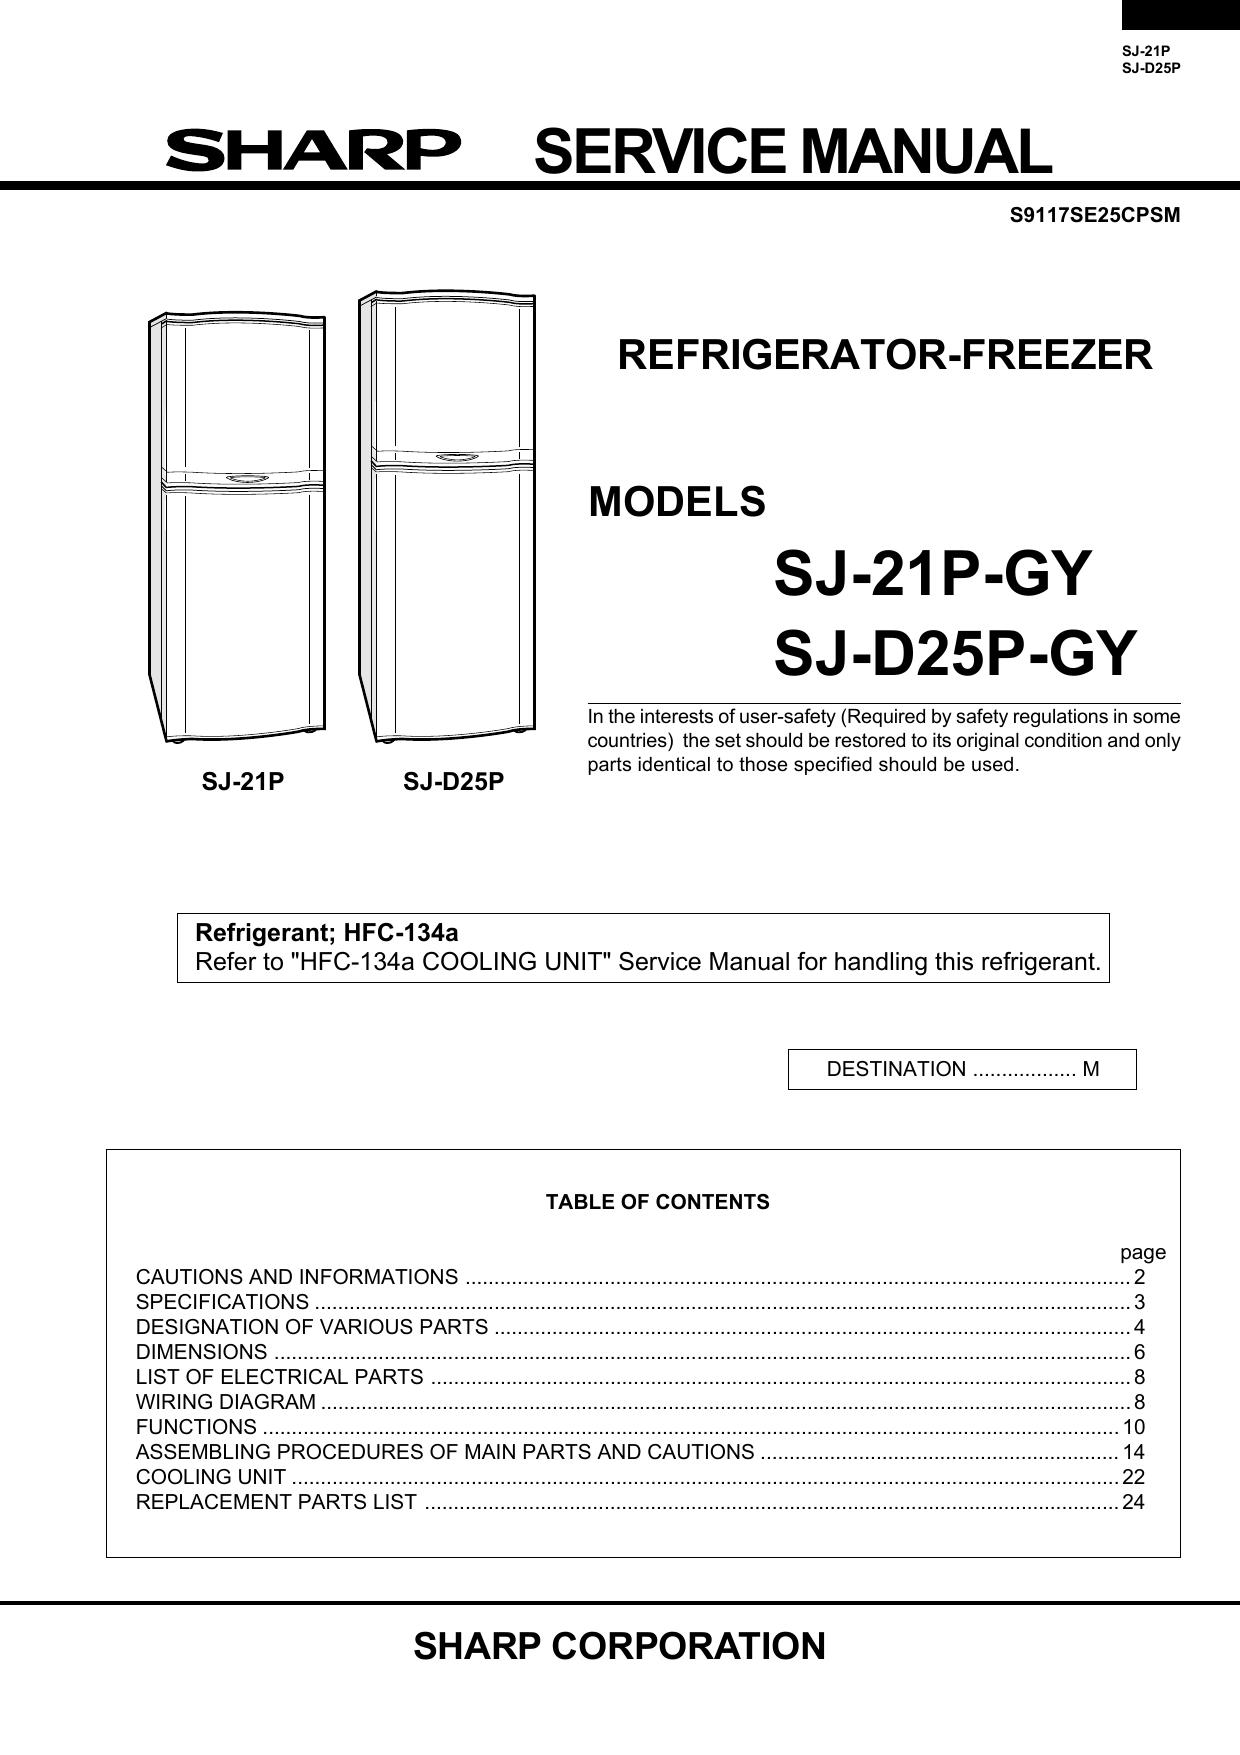 Service manual sj 21p gy sj d25p gy refrigerator freezer manualzz asfbconference2016 Images